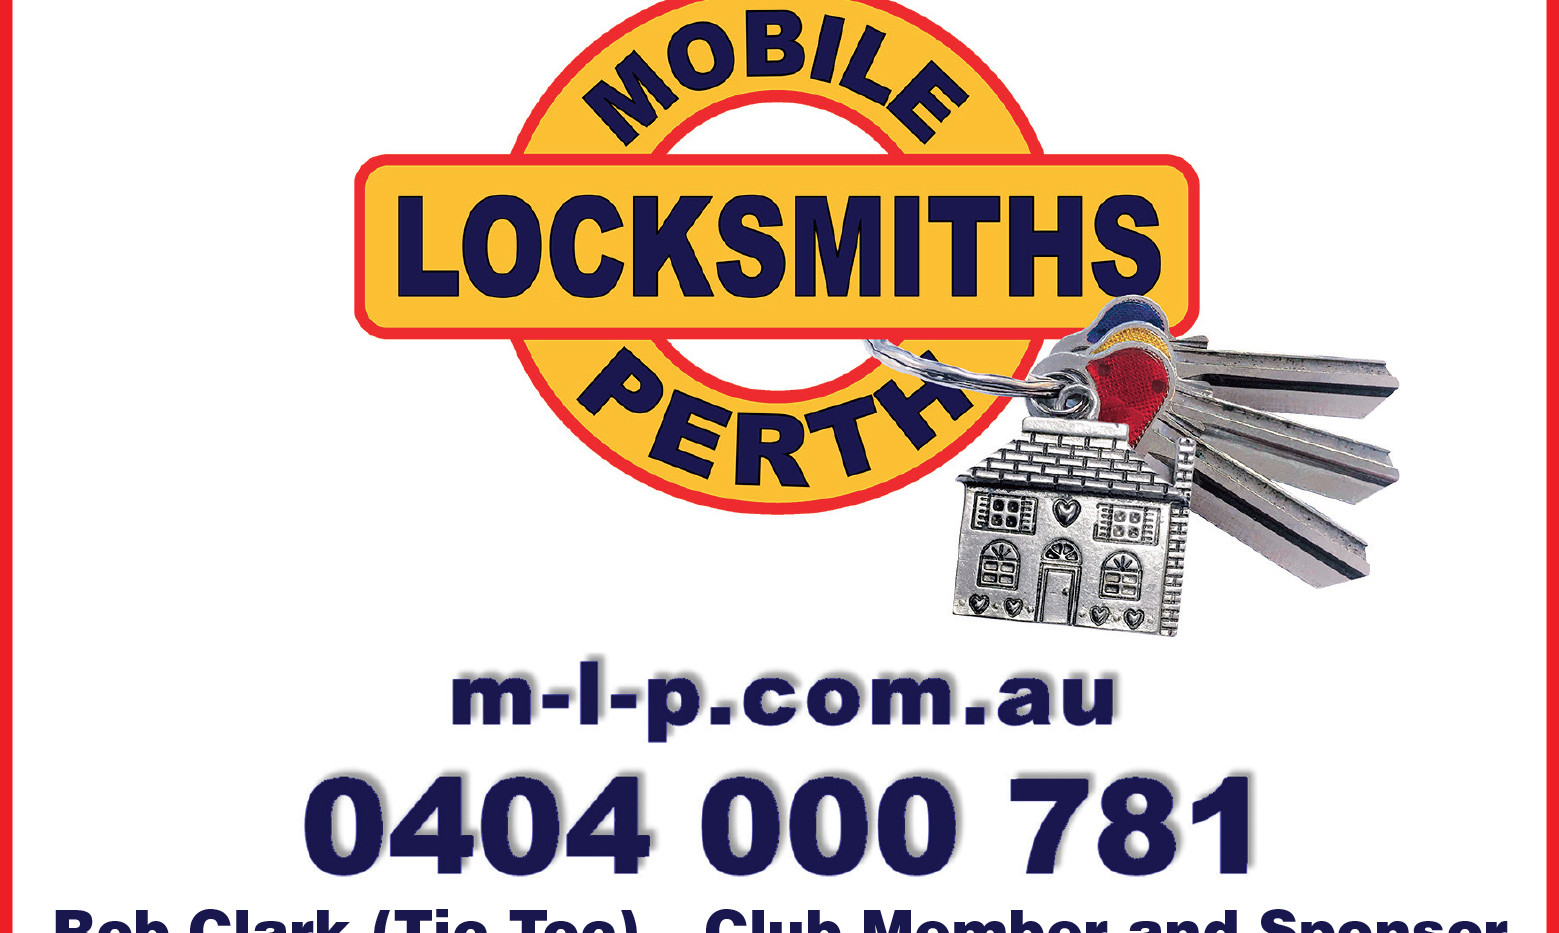 MobileLocksmiths_Ad_132x90_Sep20.jpg